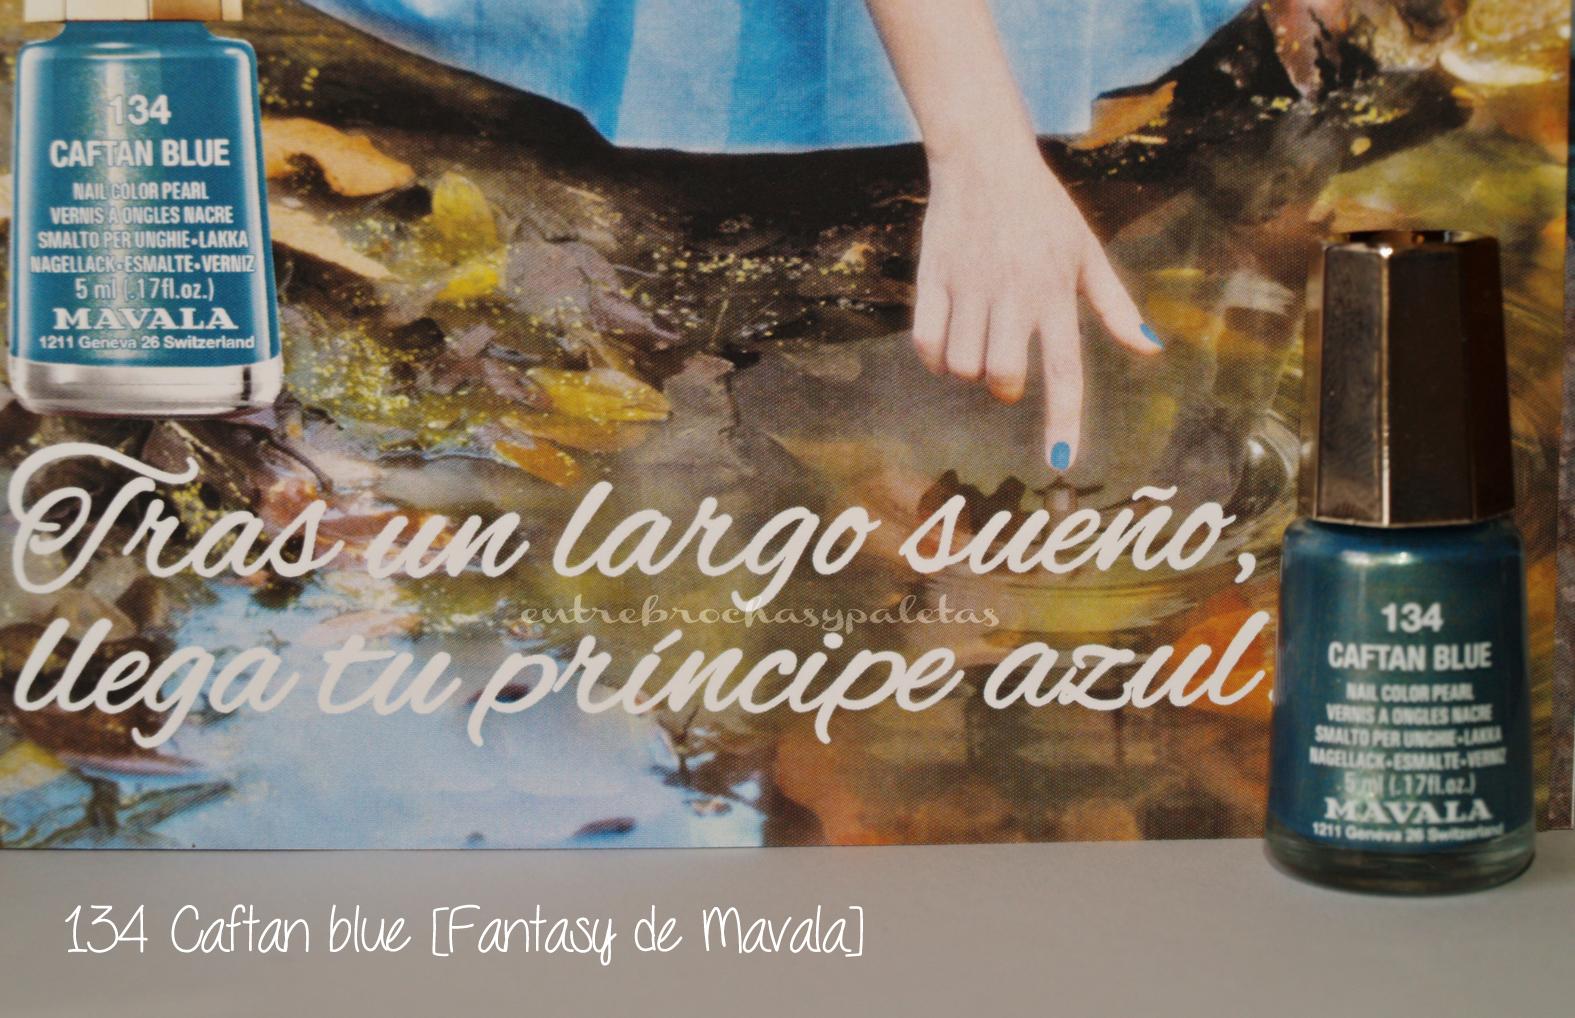 caftan blue mavala